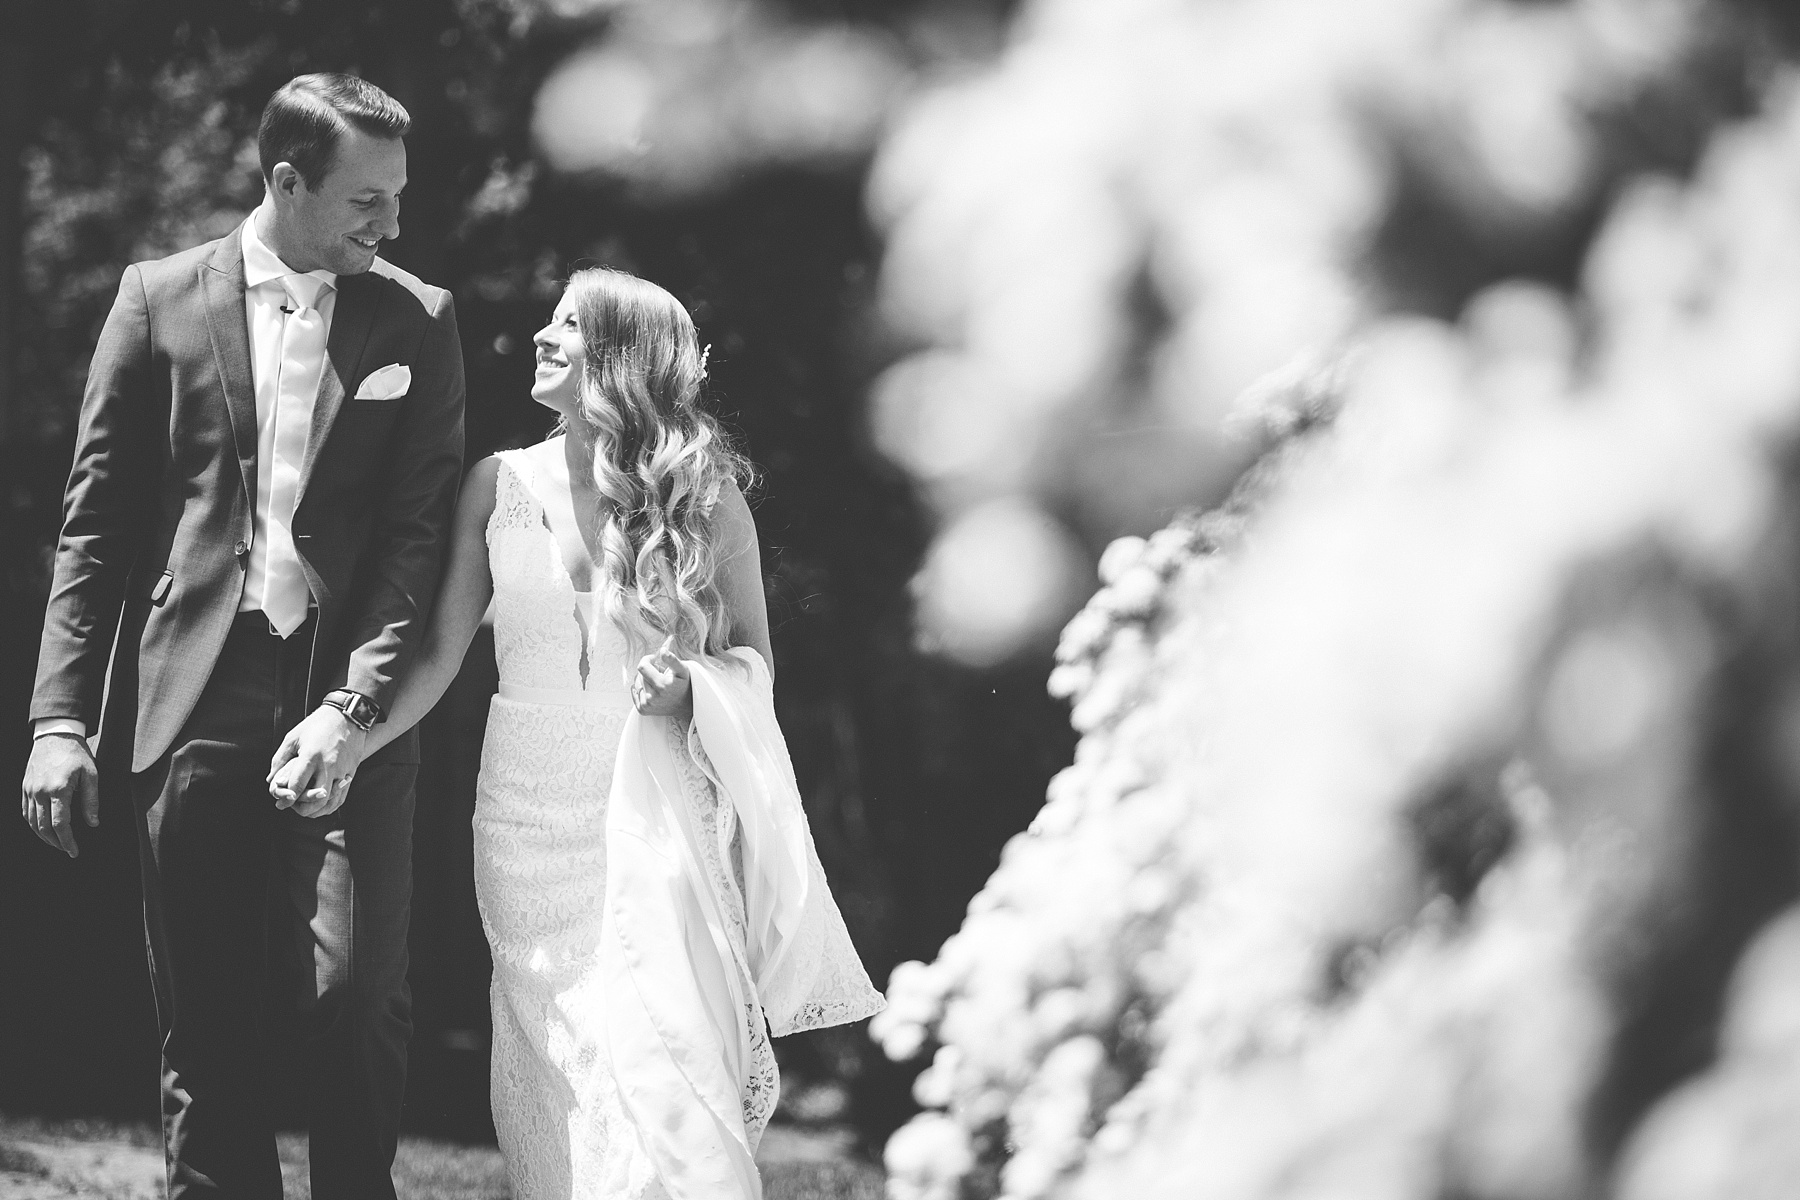 Brandon_Shafer_Photography_Kara_Doug_12_corners_Wedding_Benton_Harbor_0019.jpg